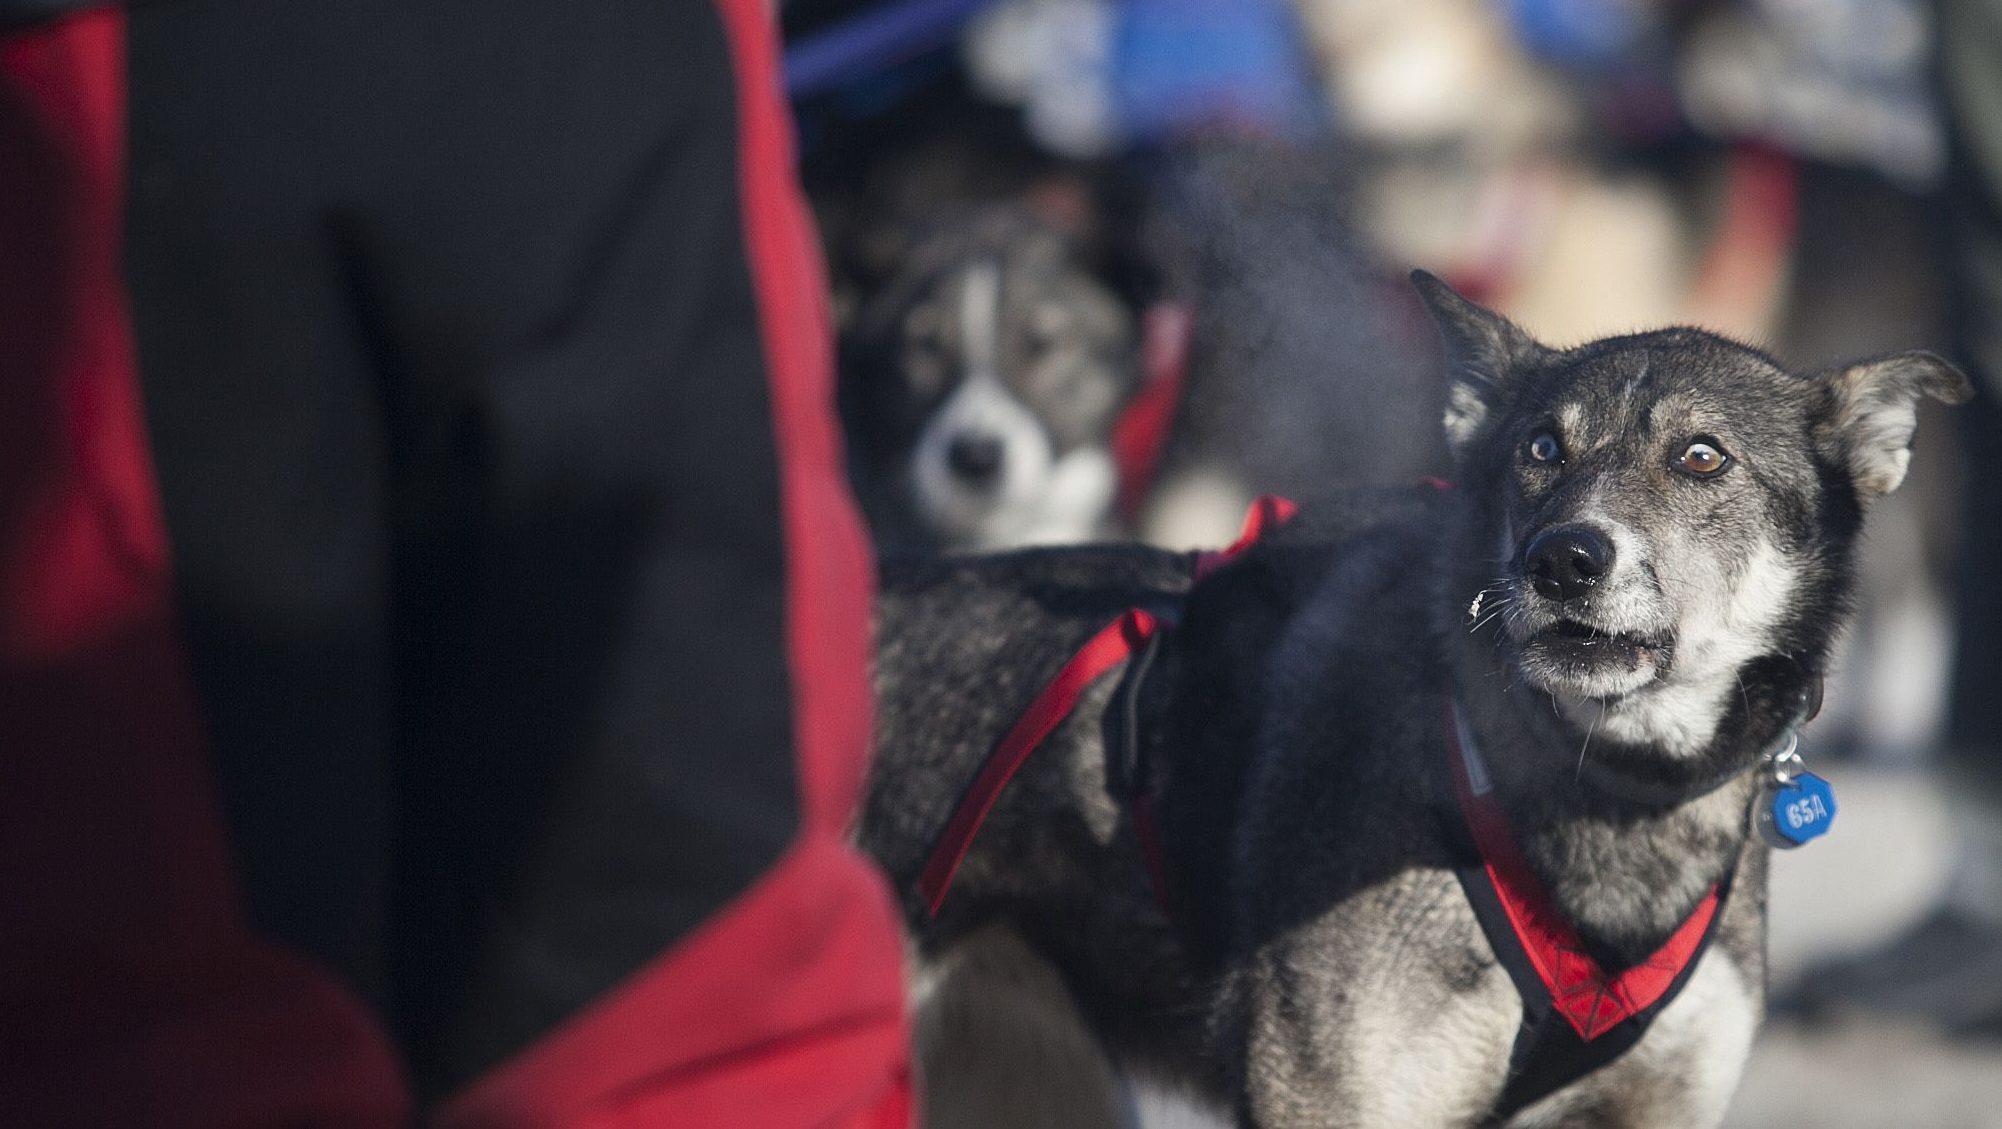 Iditarod leader yells at dogs, blows lead — Quartz at Work